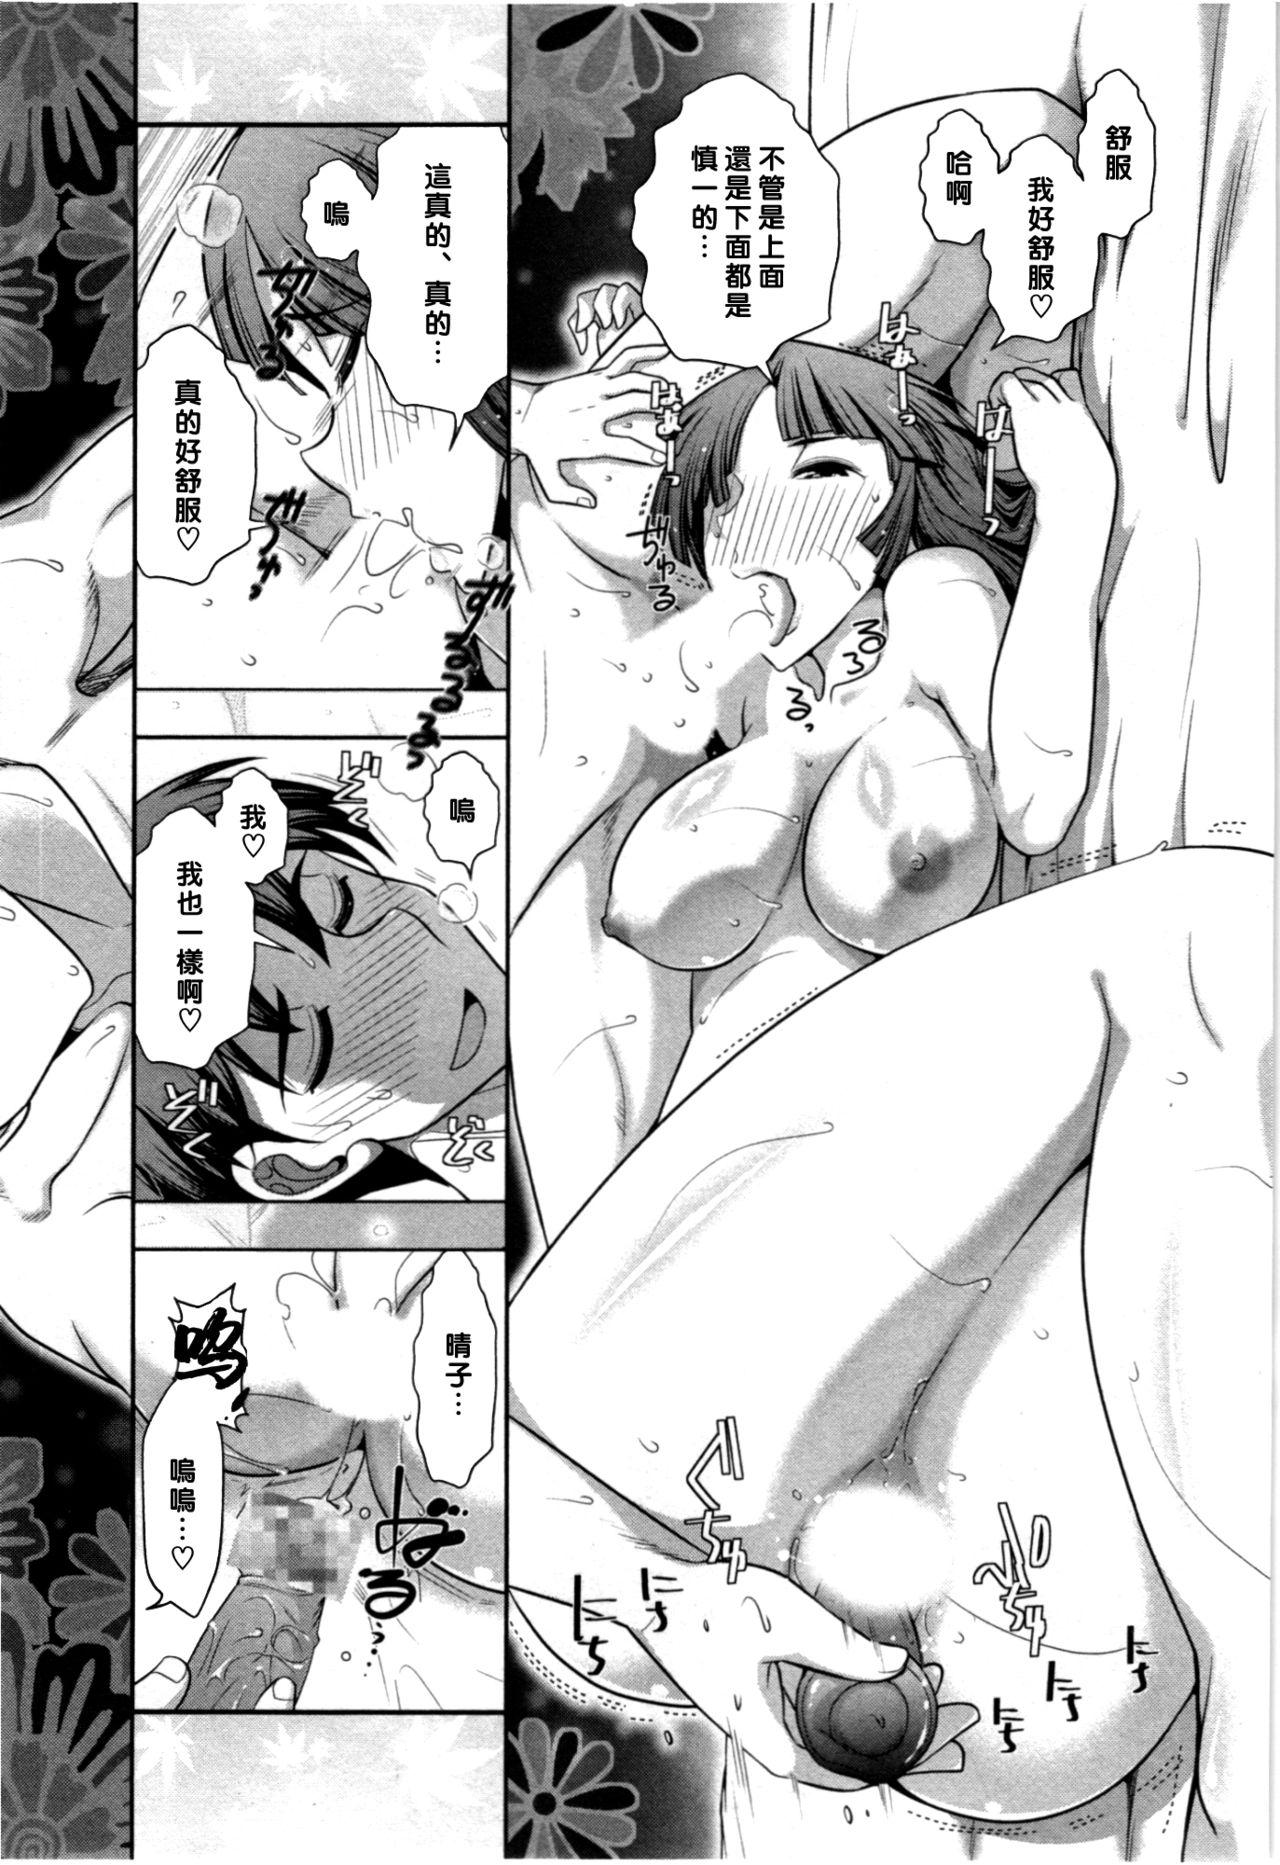 Haruko-san no Niizuma Recipe Ch. 2 14